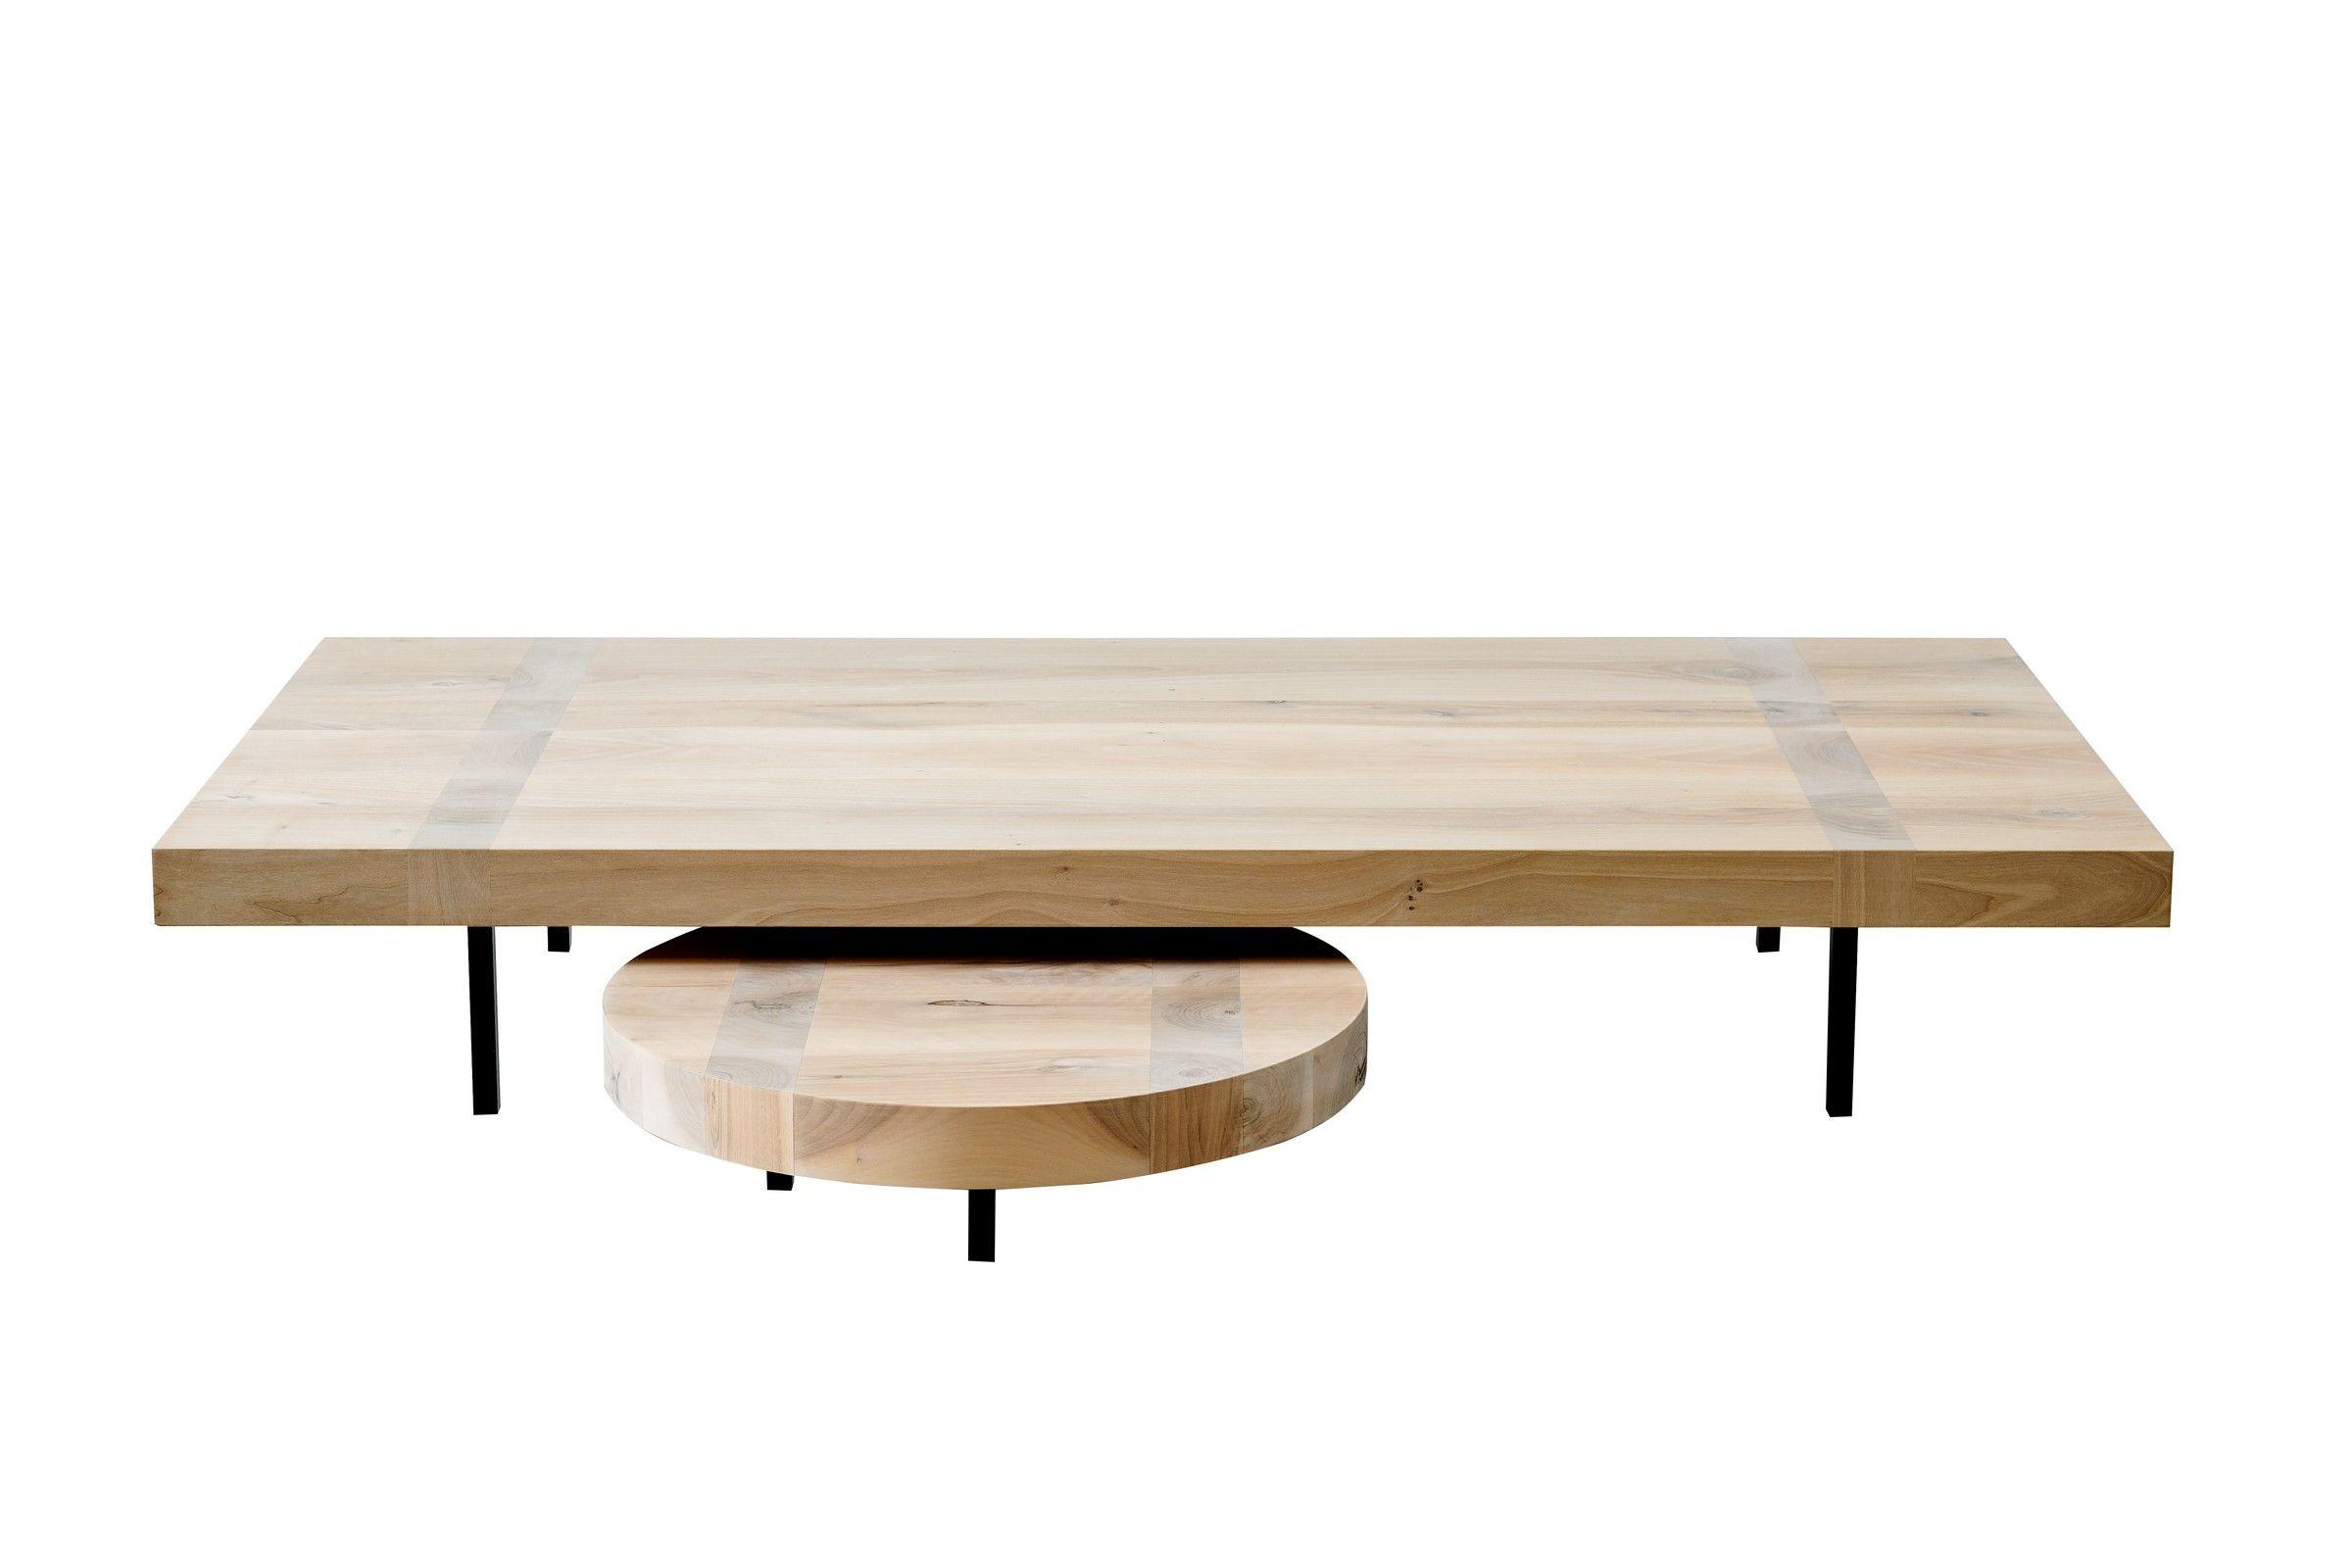 Schuifdeurkast Jelle Woood.Coffee Tables Jacoba By Pilat Pilat Archello